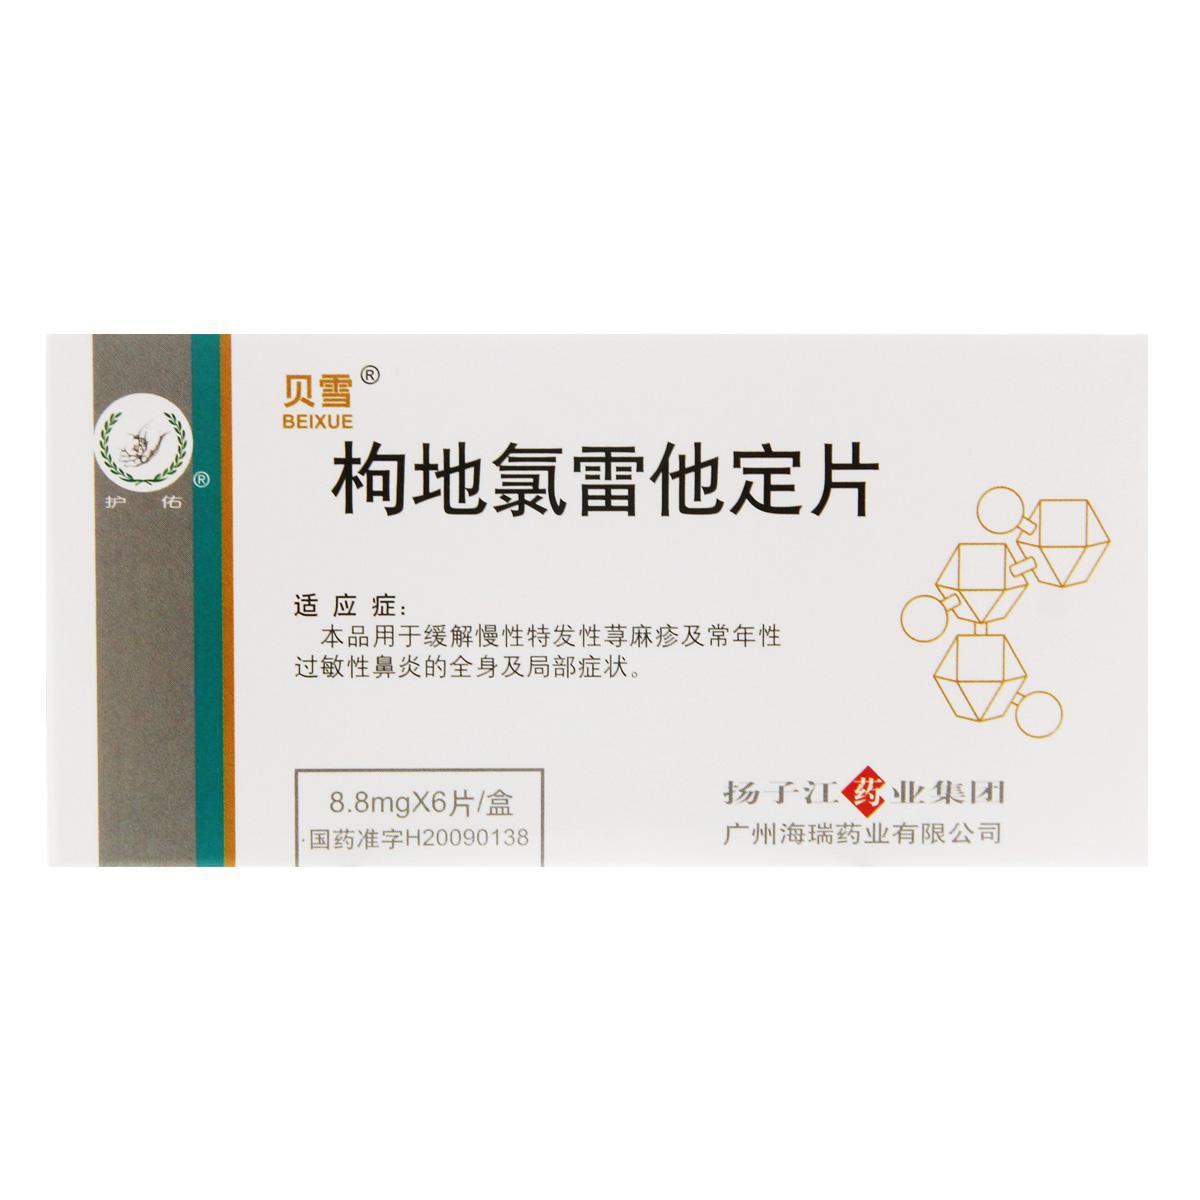 Bexue lycopene таблетки 8,8 мг * 6 таблеток / коробка